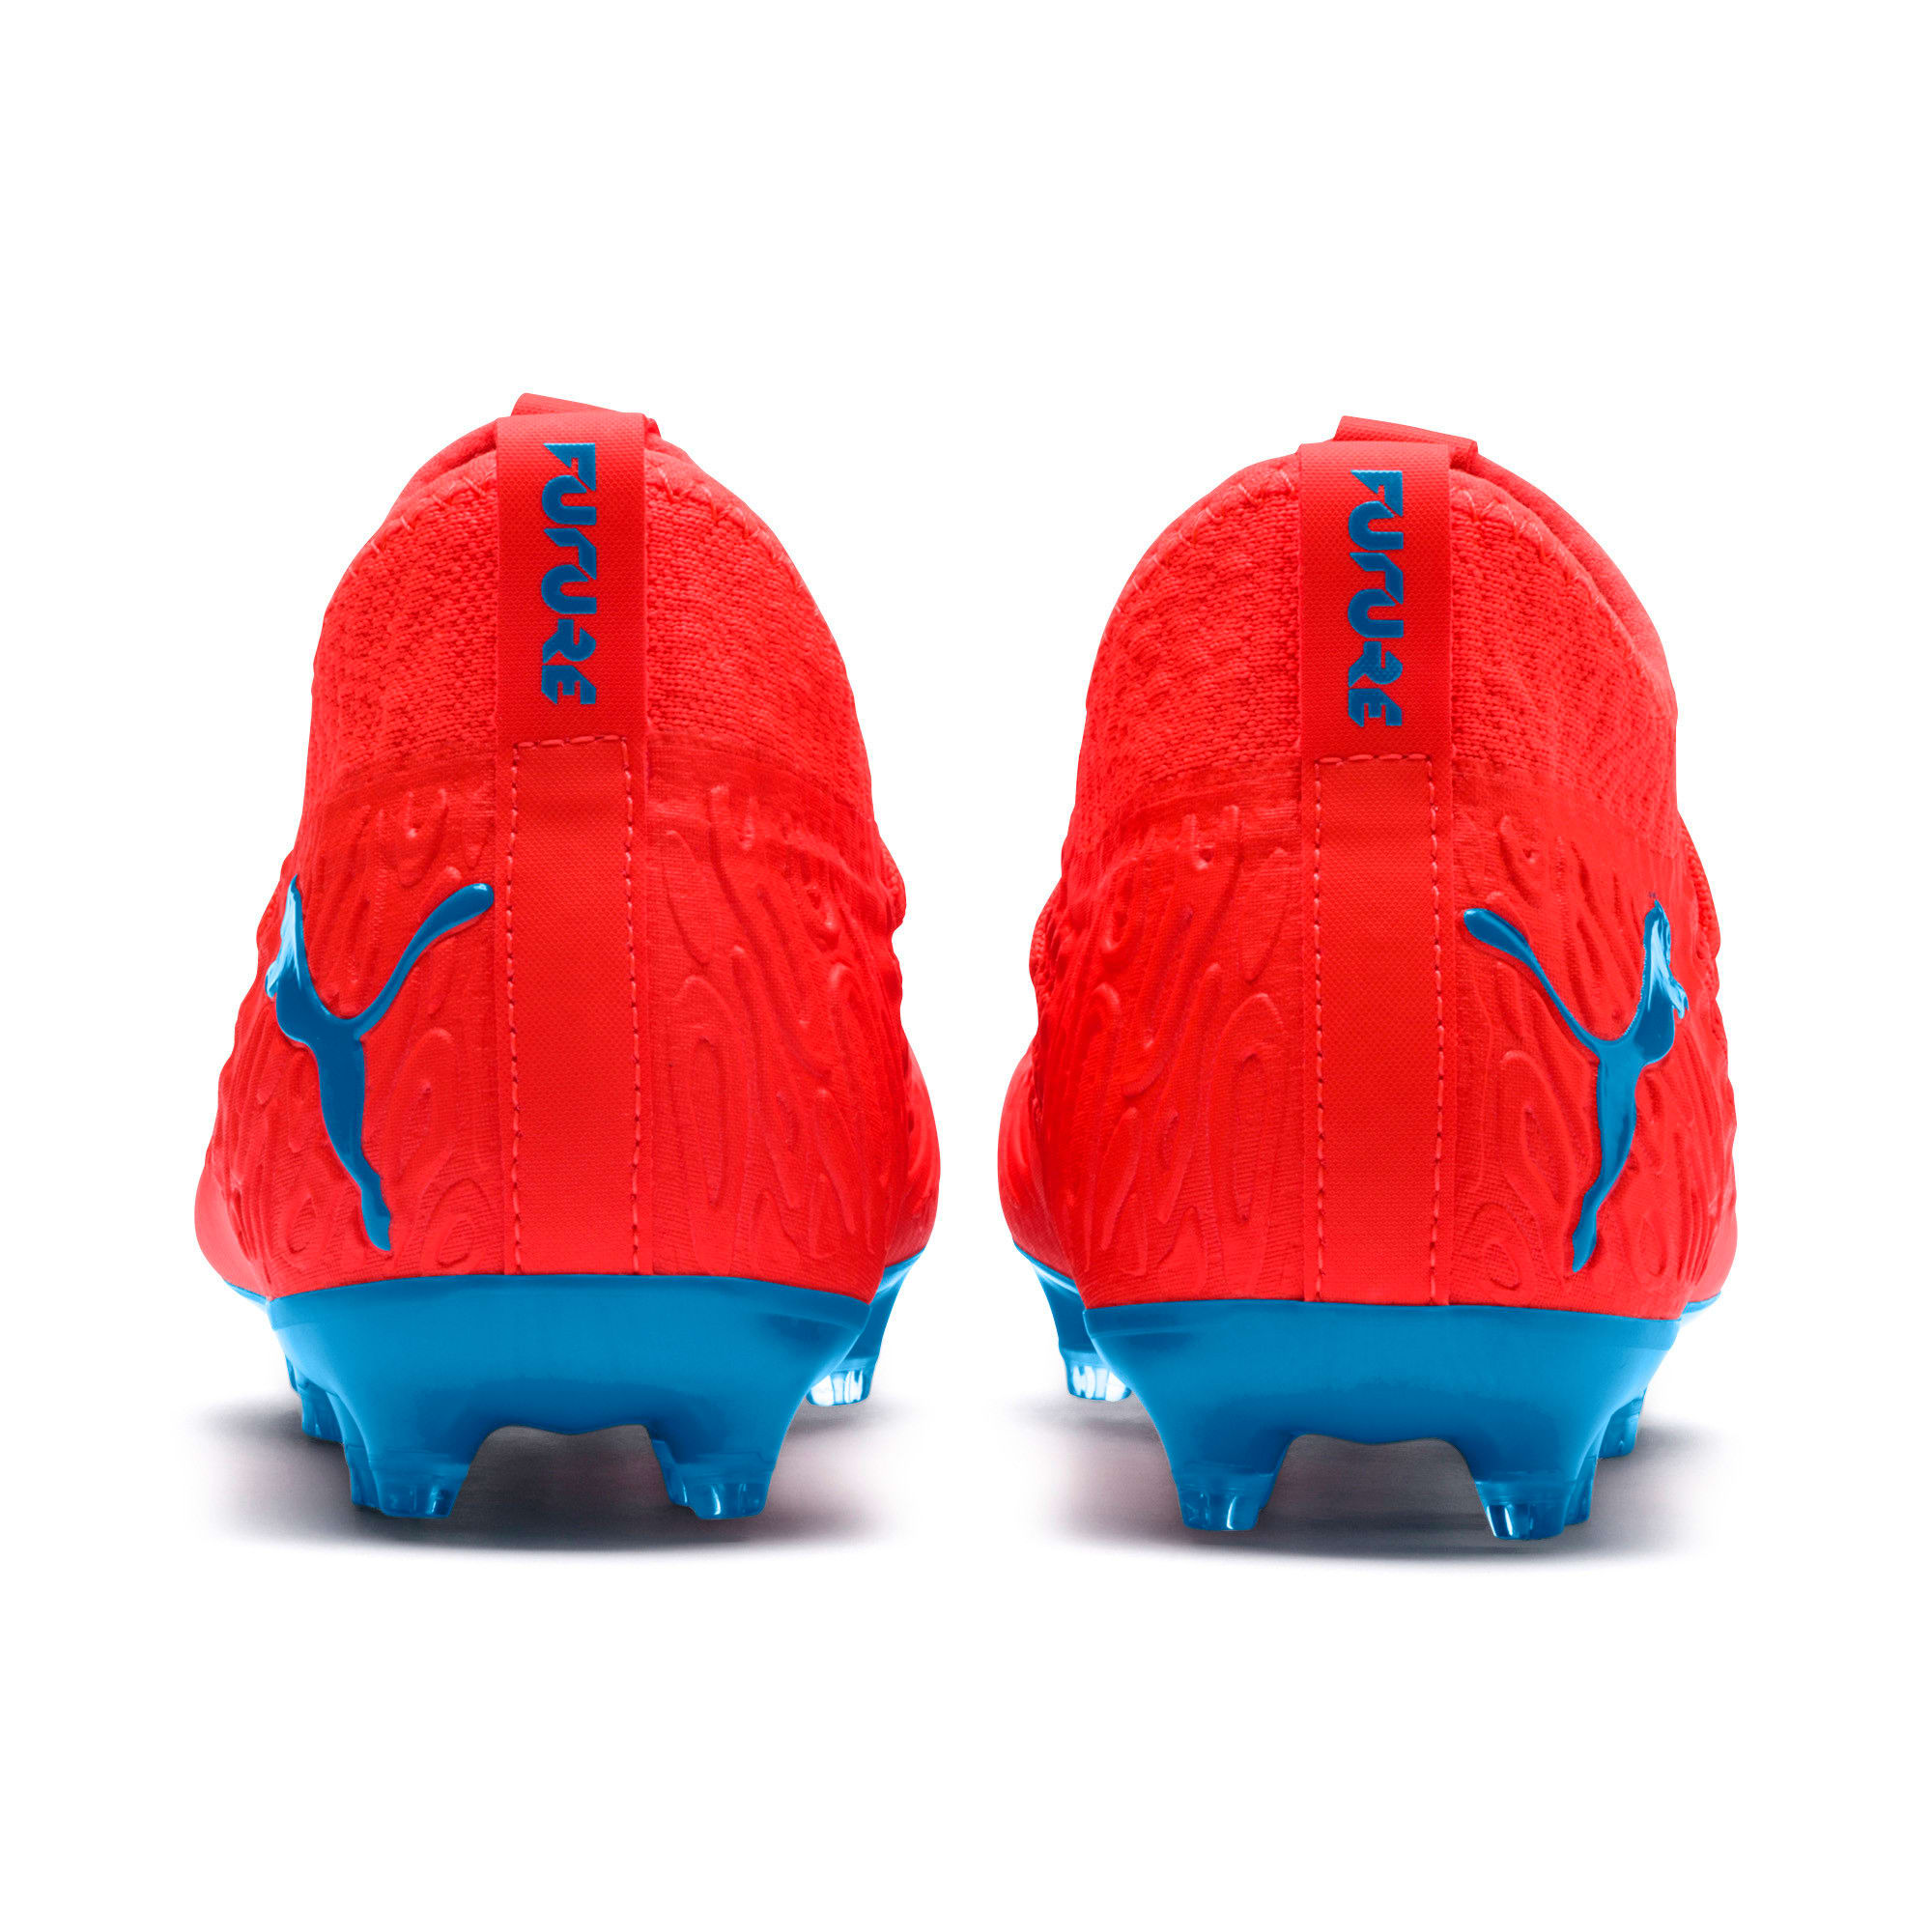 Thumbnail 3 of FUTURE 19.3 NETFIT FG/AG Soccer Cleats JR, Red Blast-Bleu Azur, medium